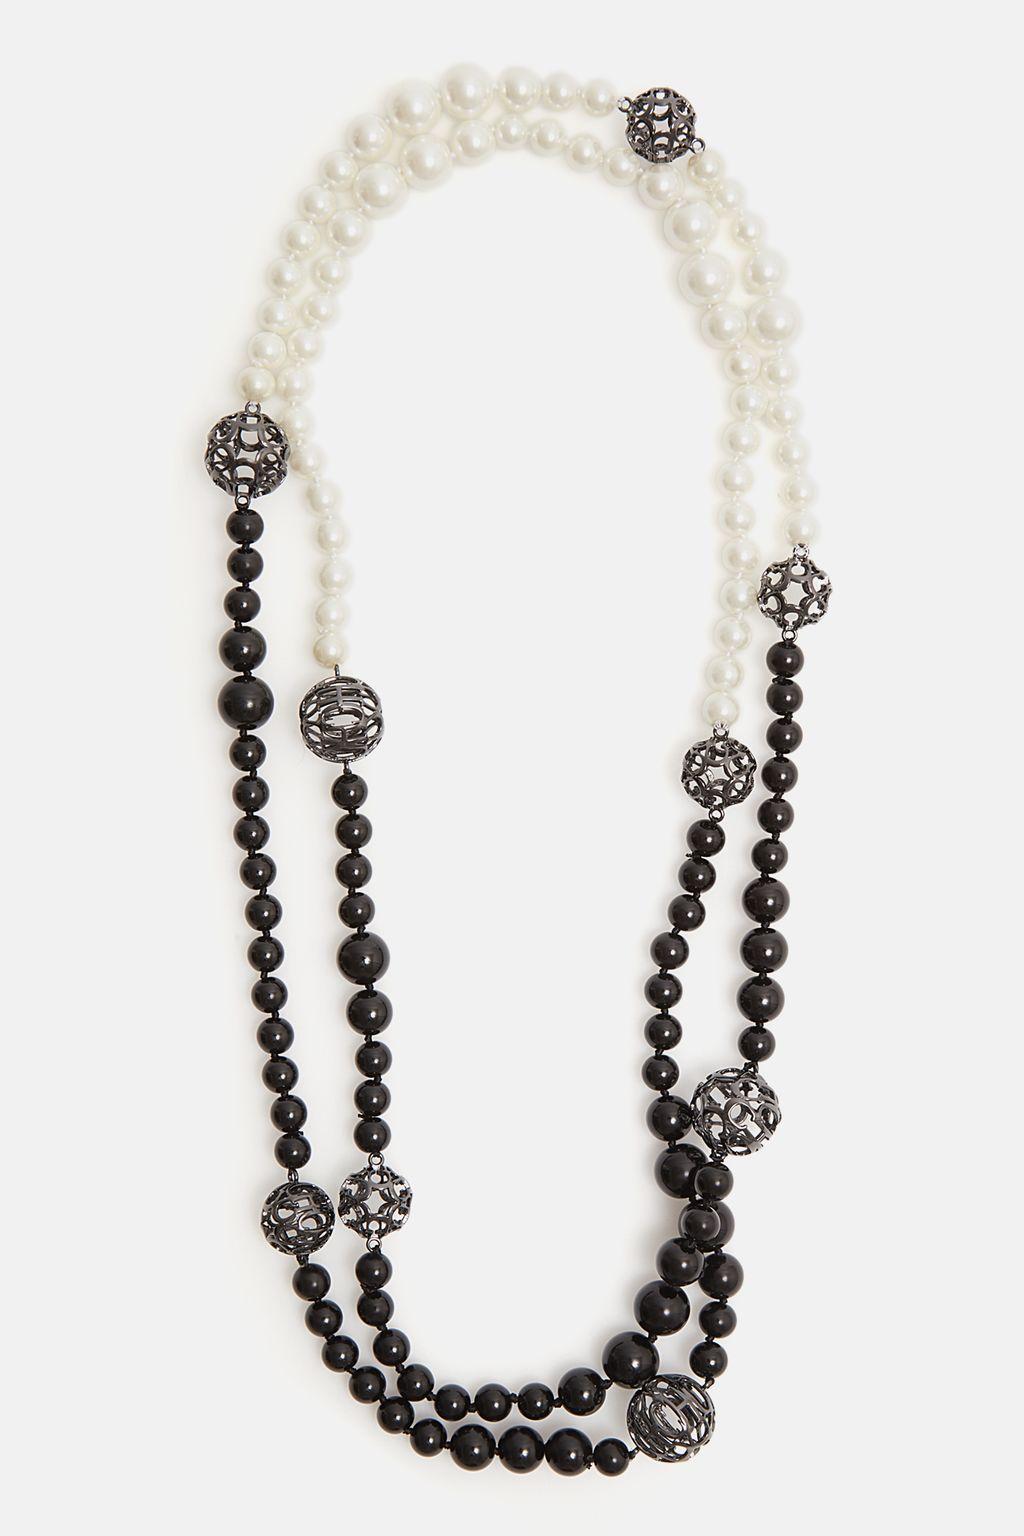 Oribe necklace